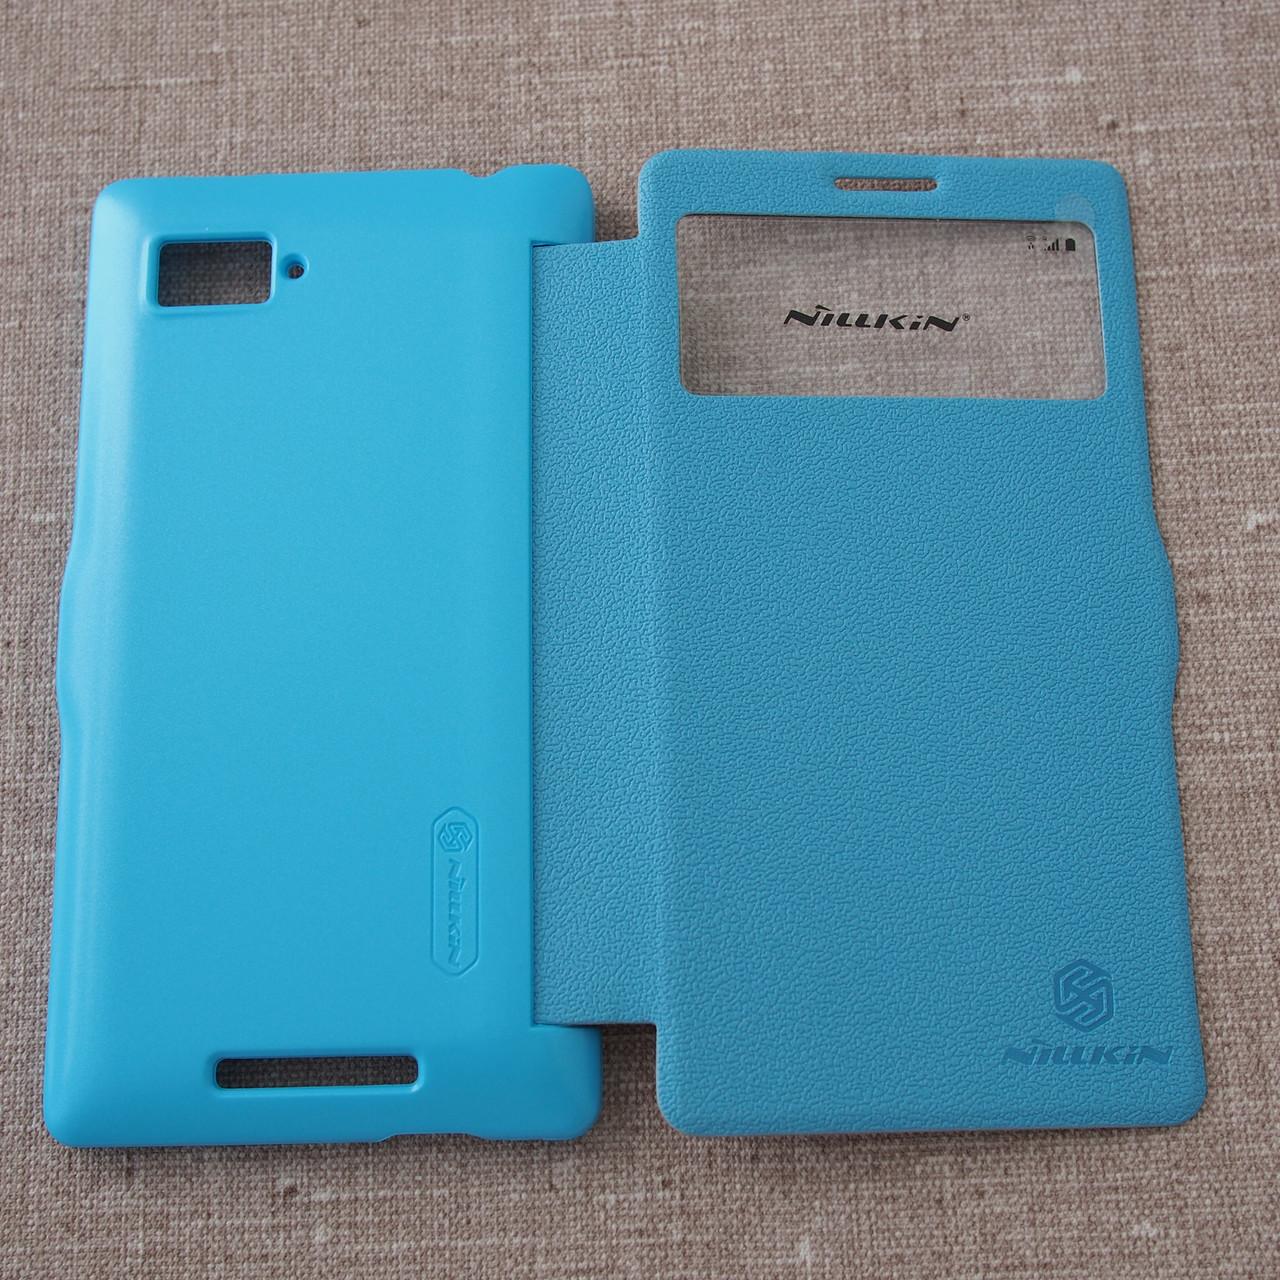 Чехол Nillkin Fresh Lenovo K910 light-blue Для телефона